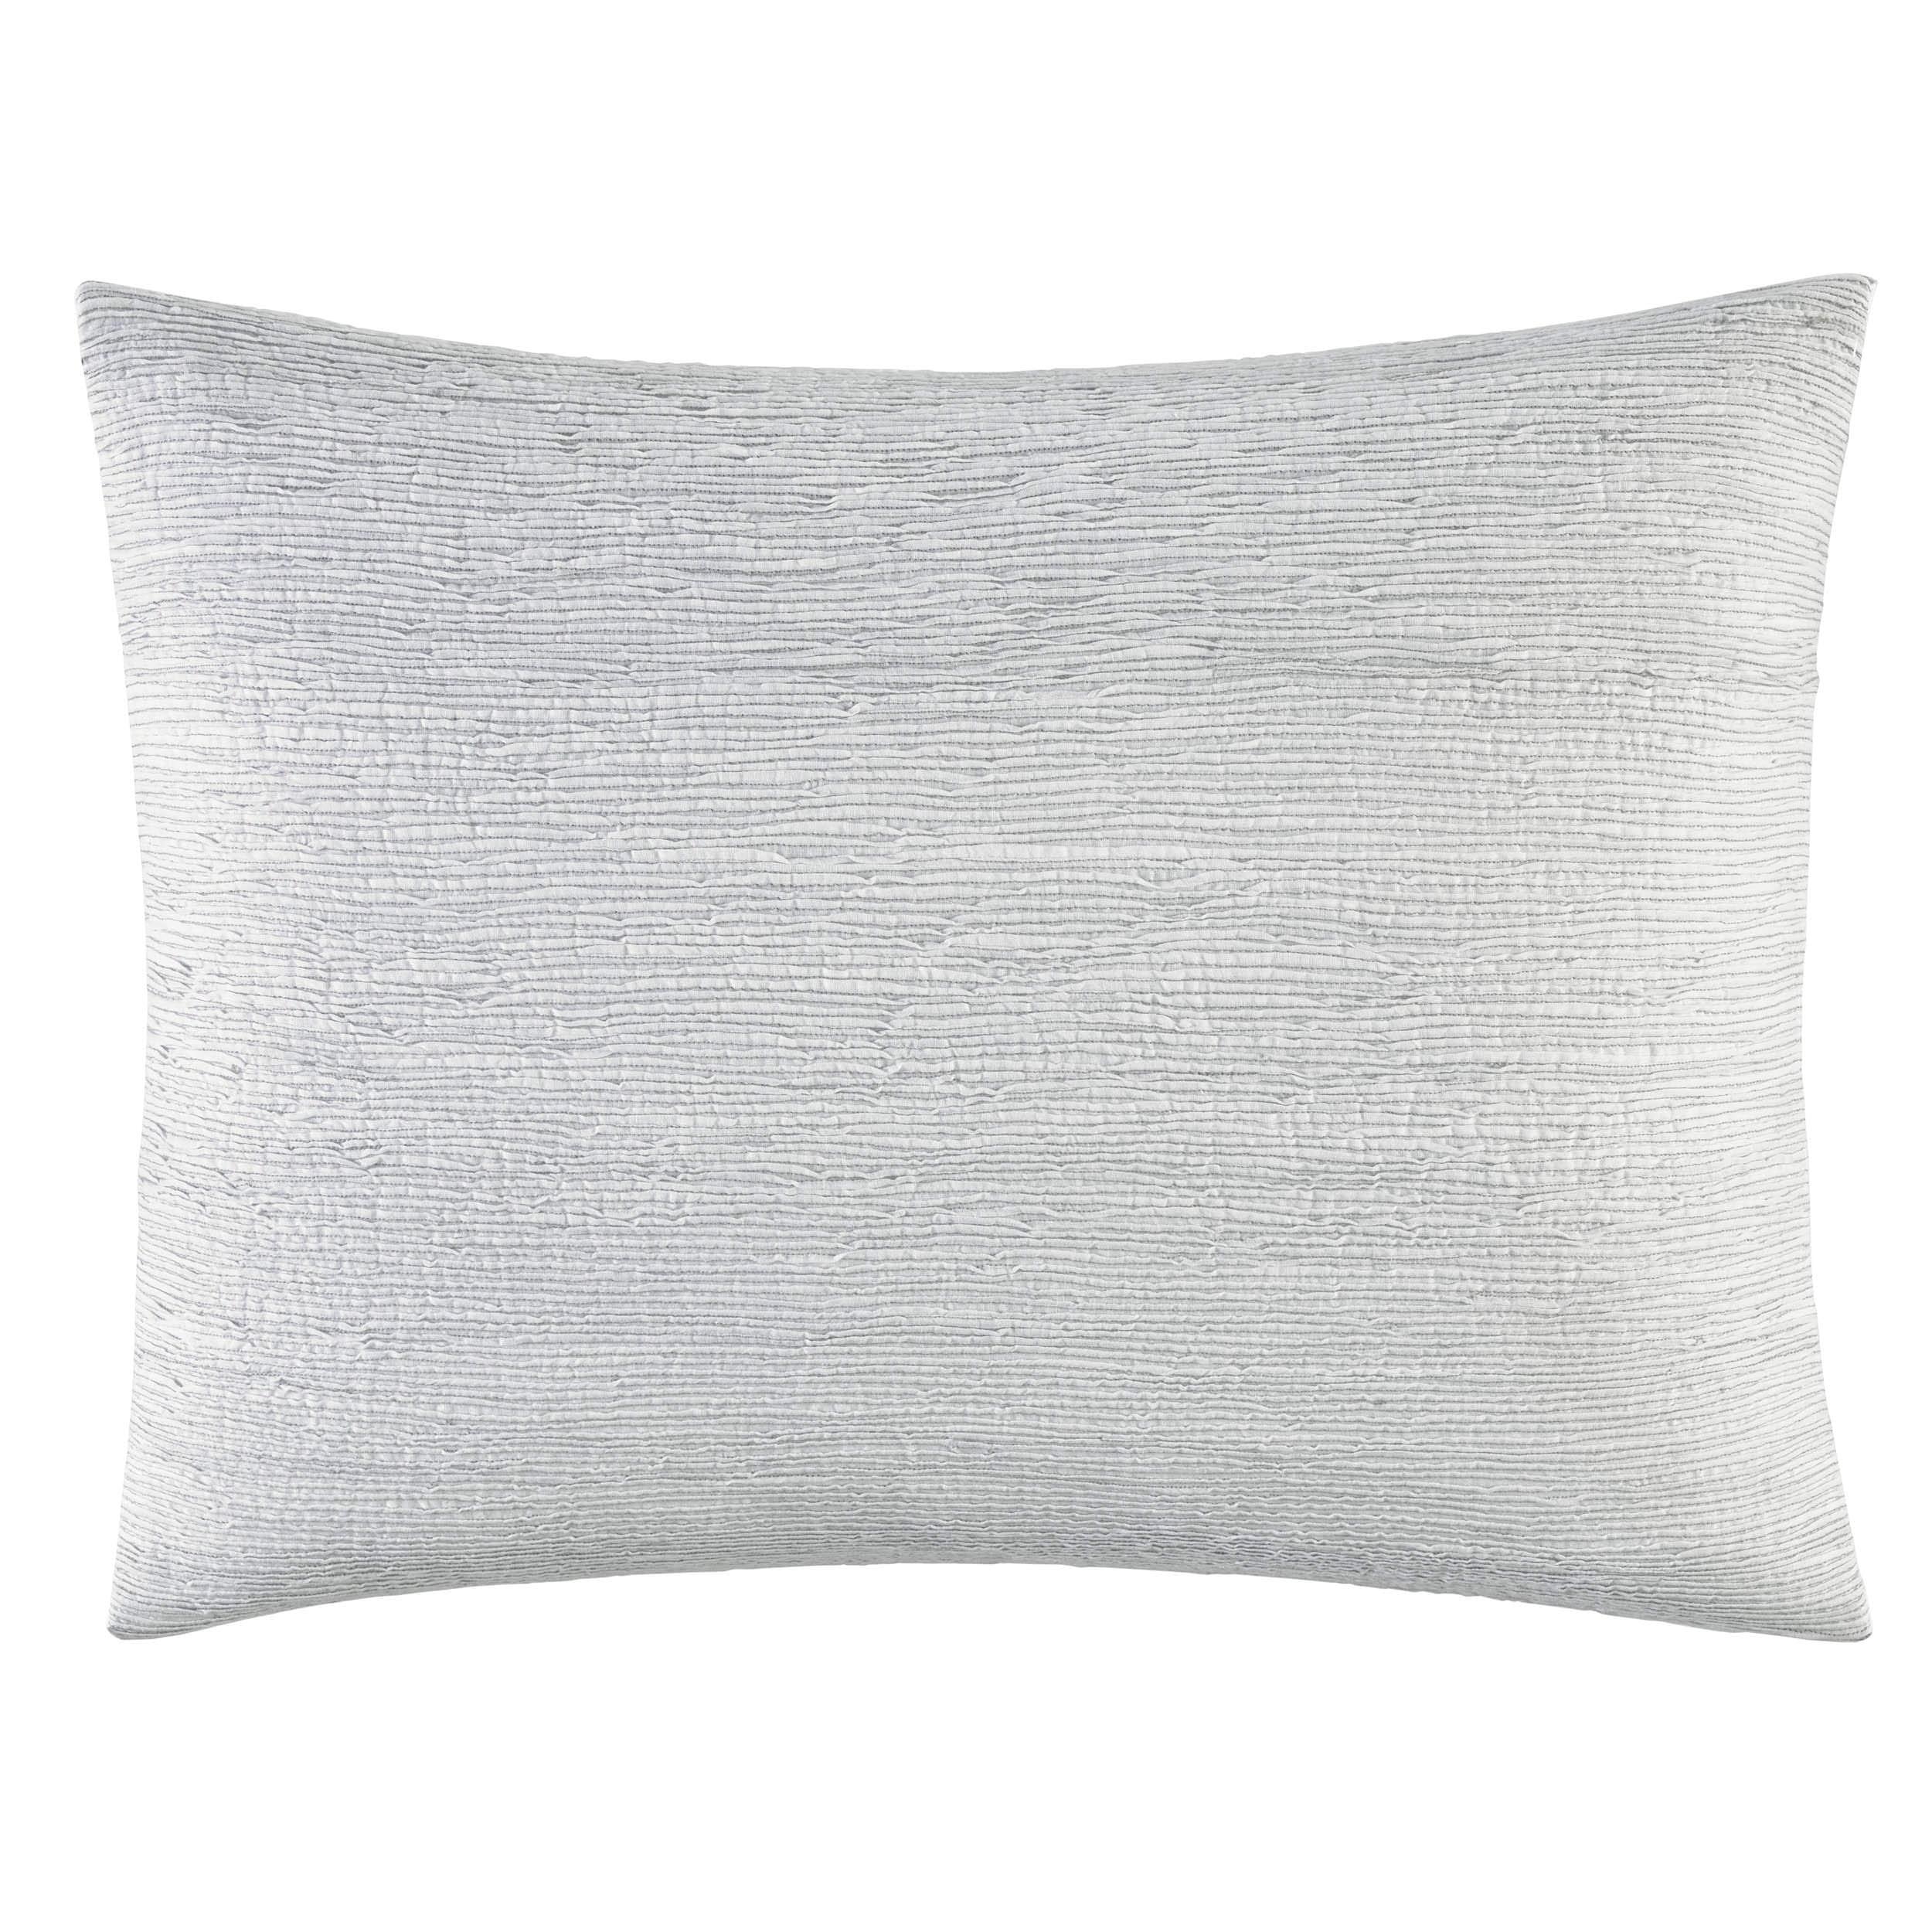 Vera Wang Dergade Woven Horizontal Texture Throw Pillow Overstock 23122377